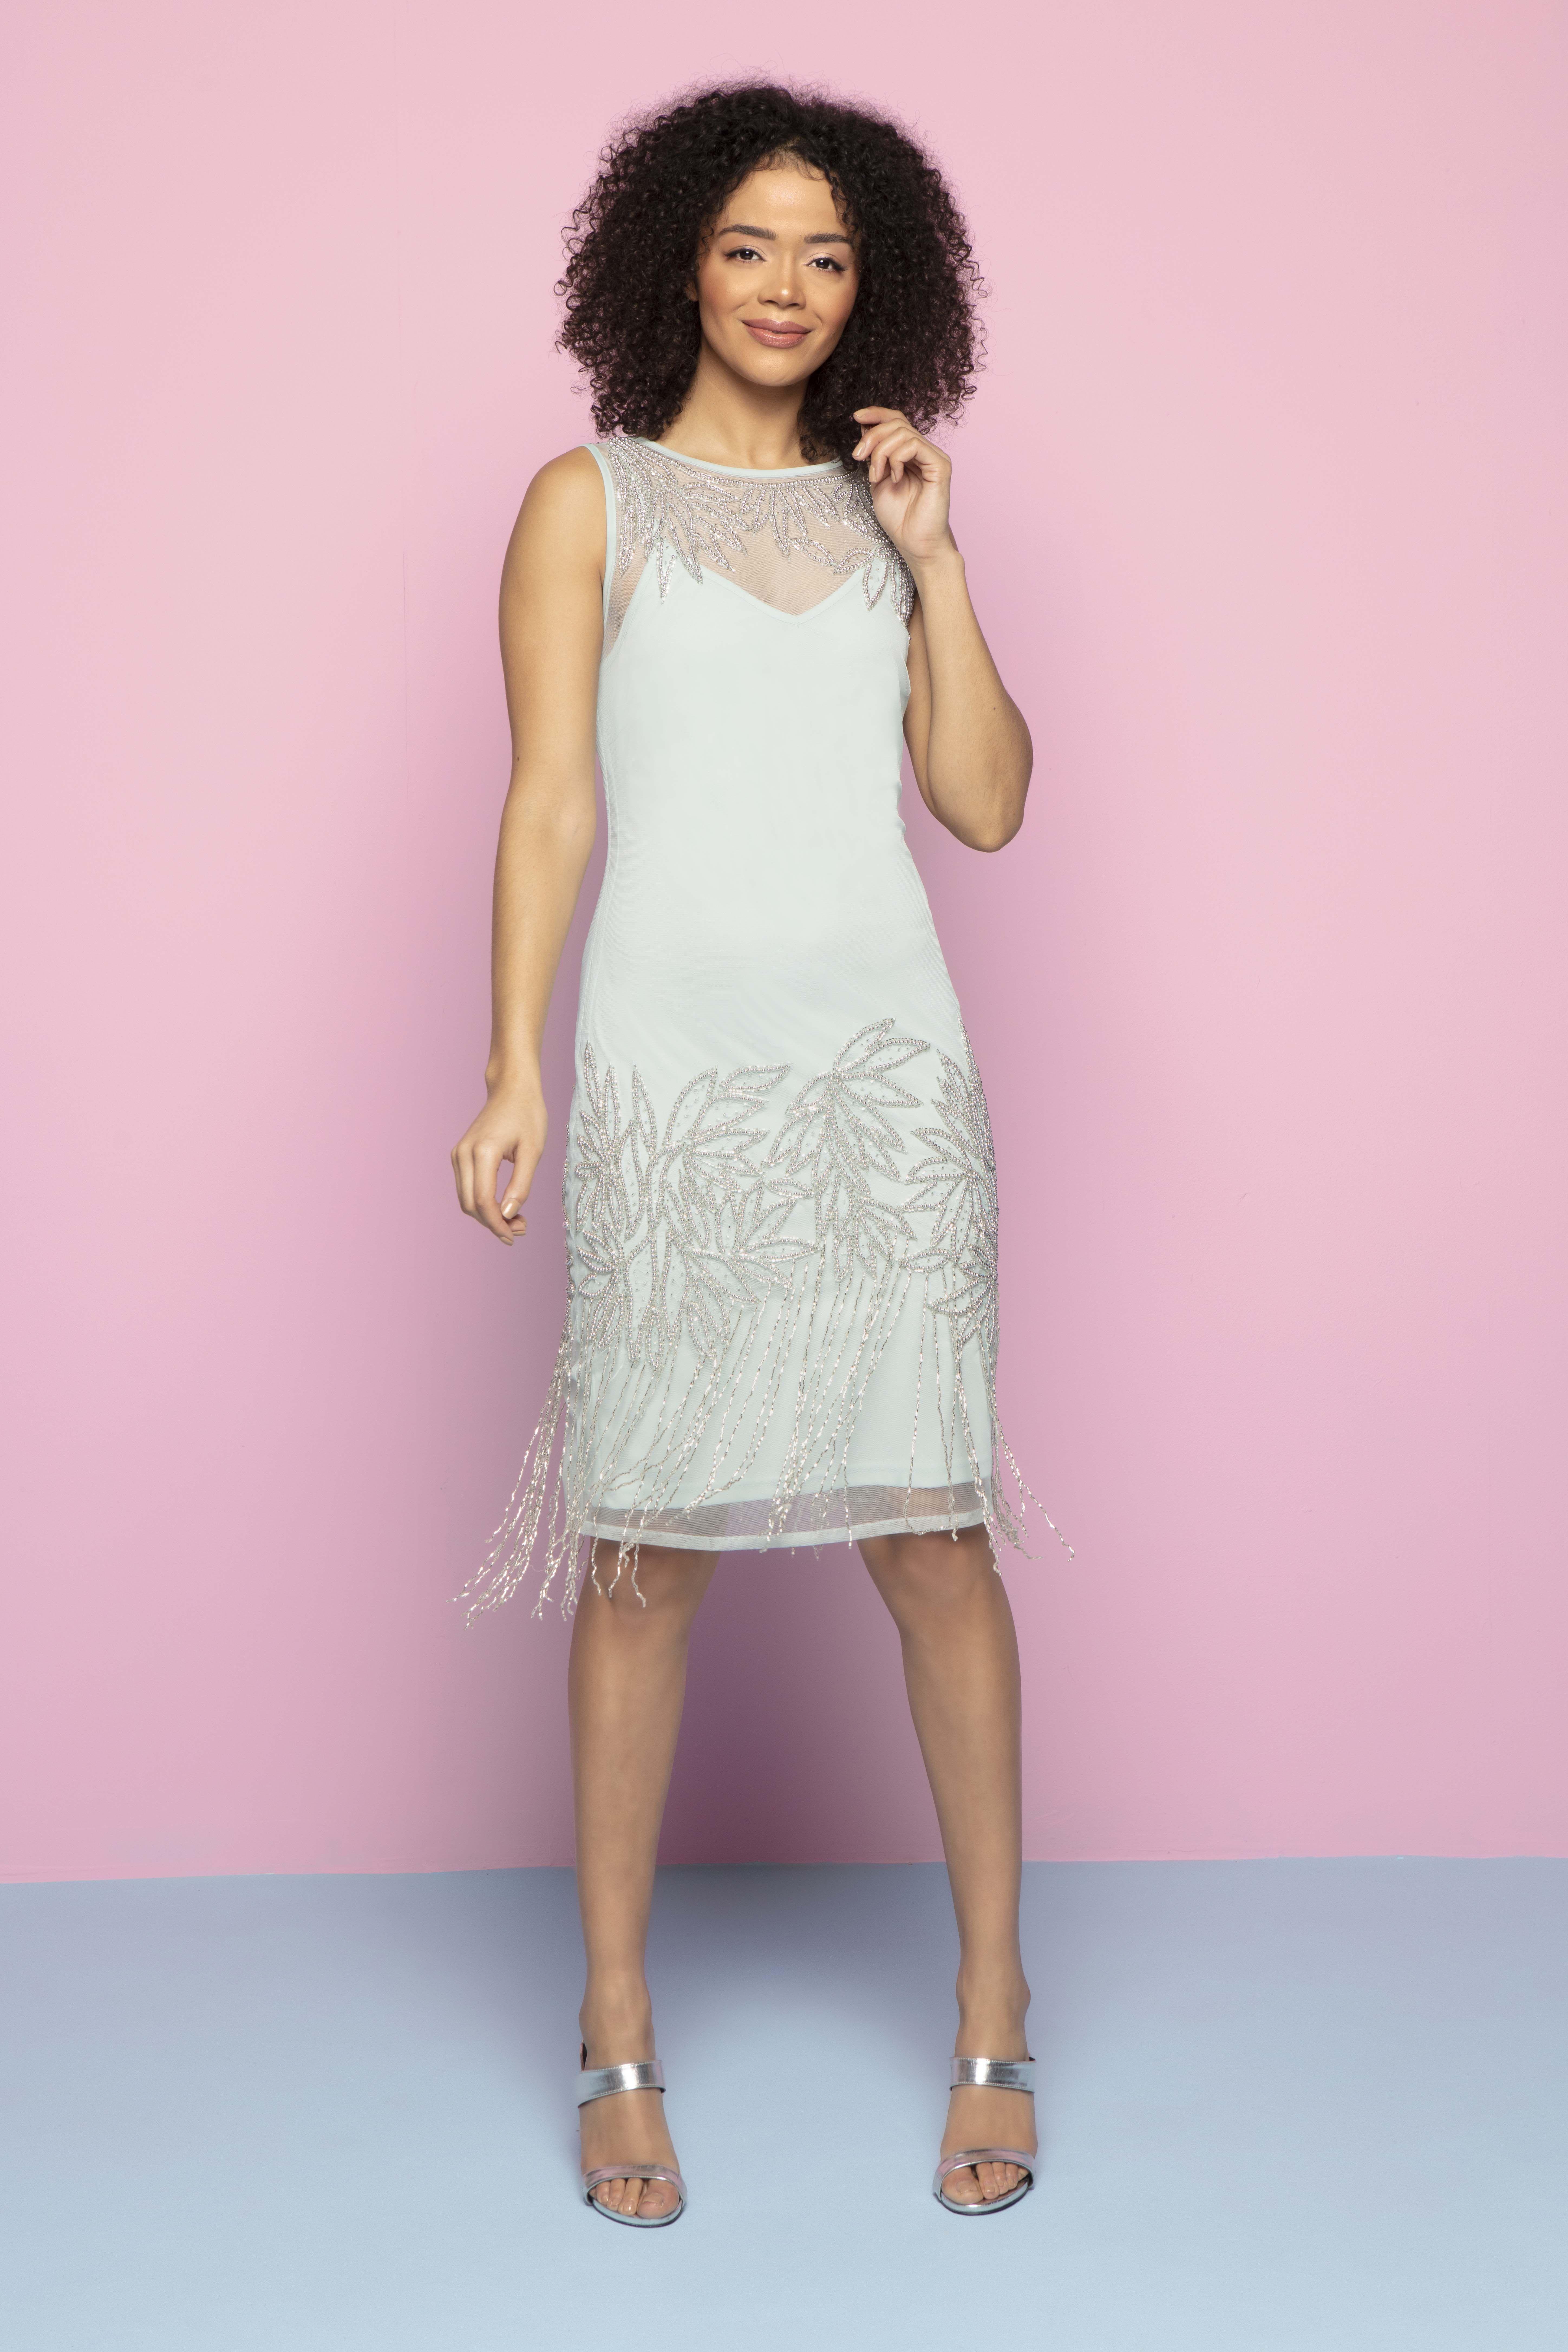 8a968bc450317 Embellished Flapper Dress in Mint - Roman Originals UK | Roman SS19 | Roman  originals, Dresses, Lace skirt